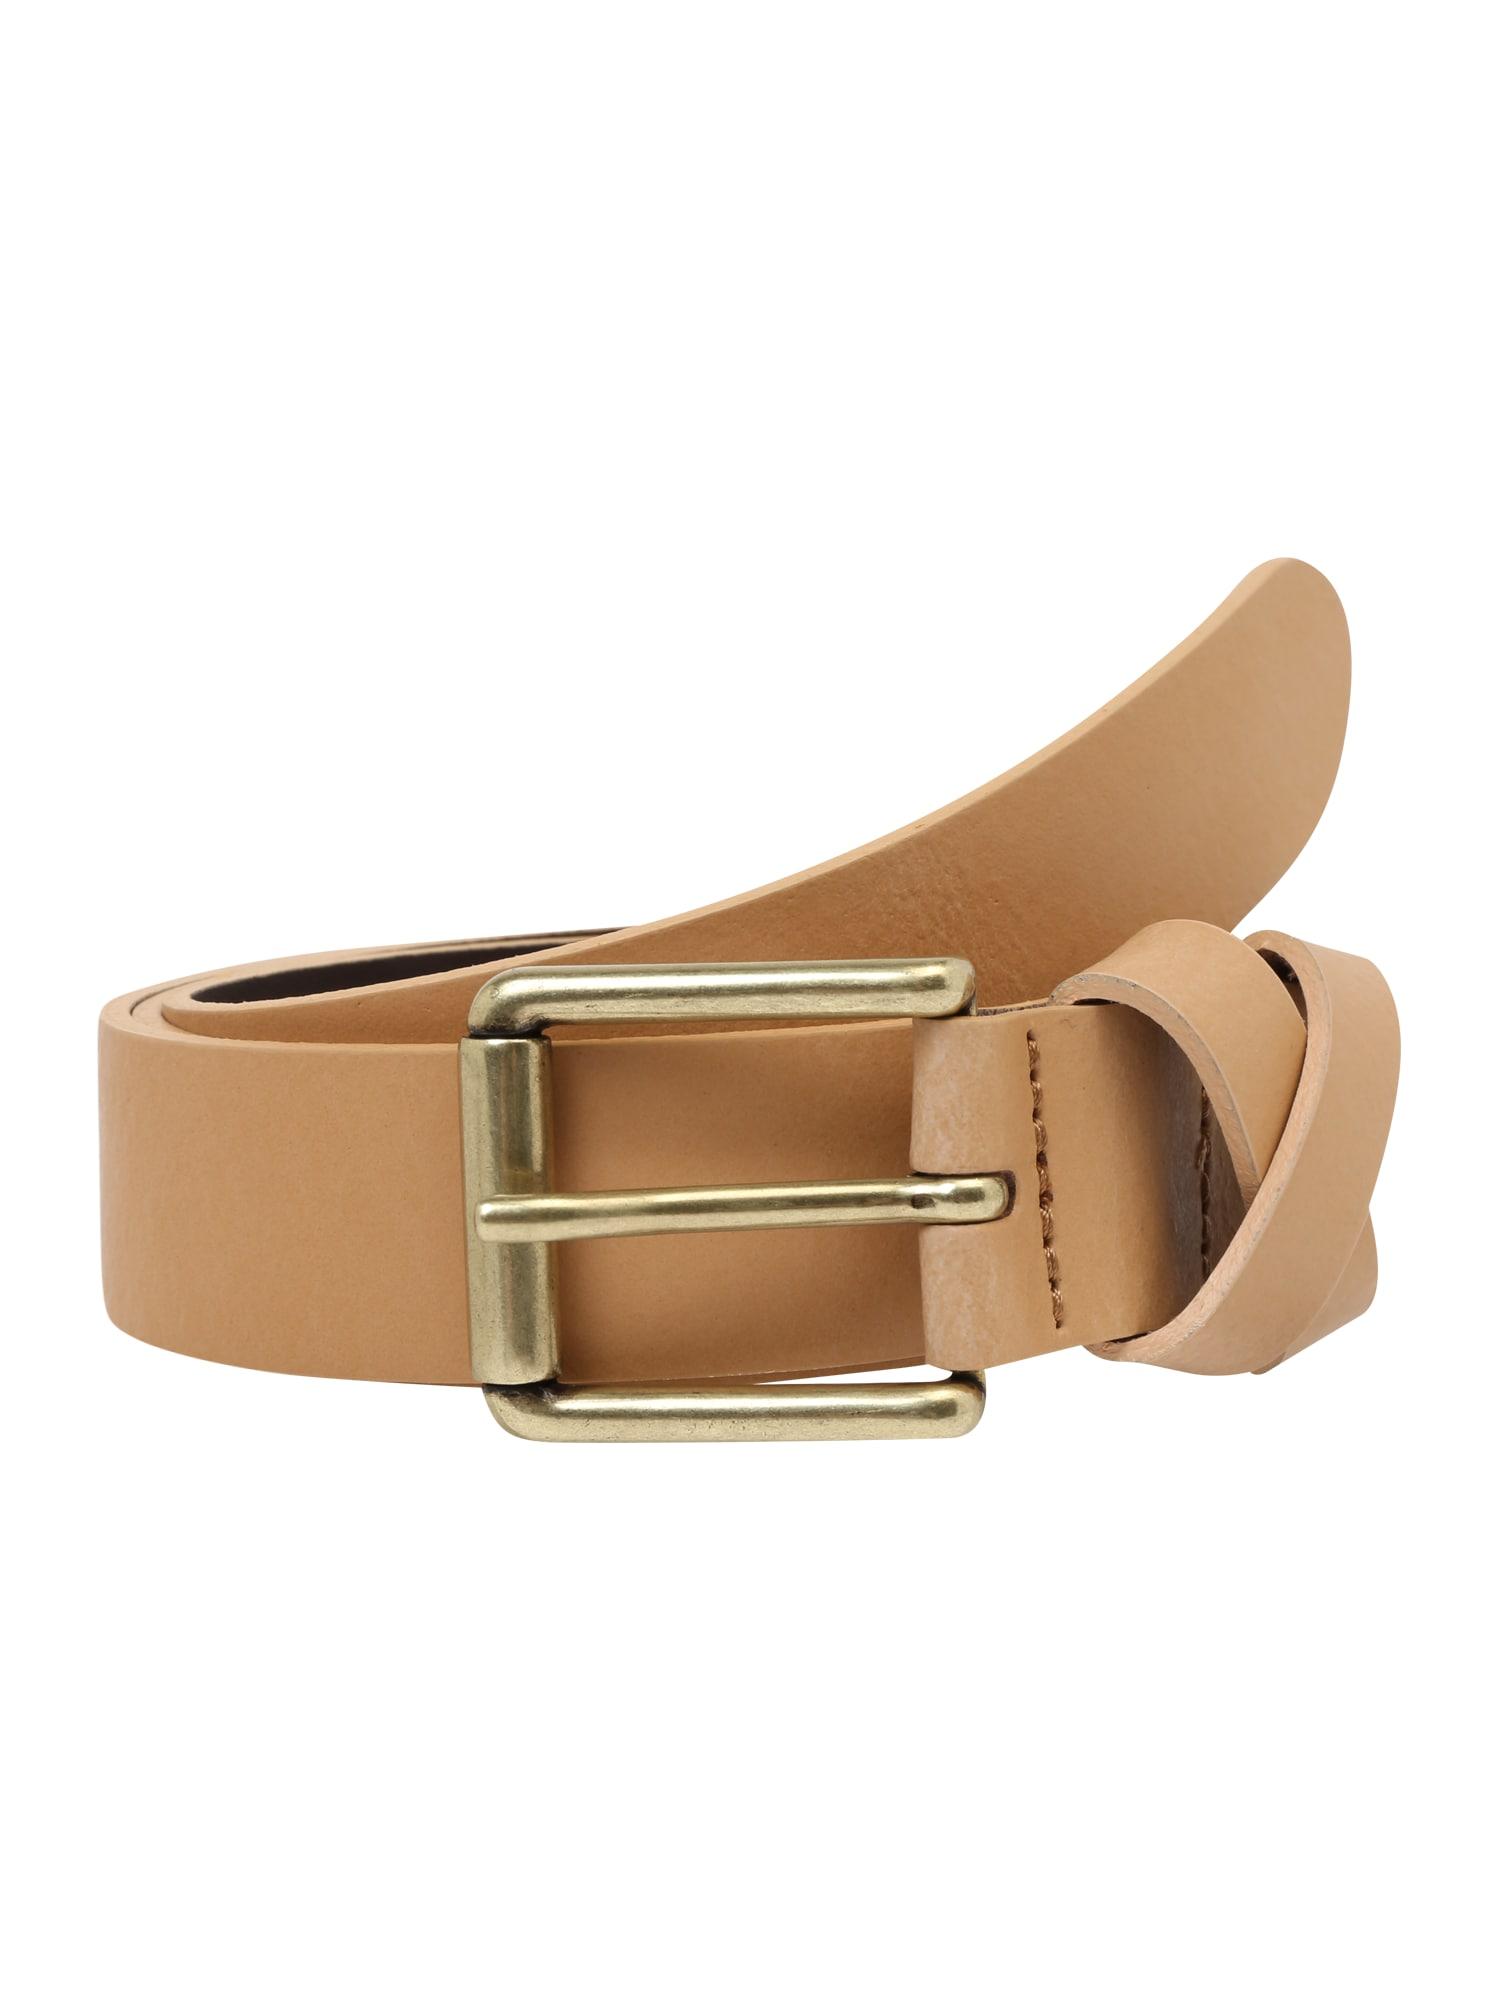 ESPRIT Diržas 'CC loop belt' kupranugario